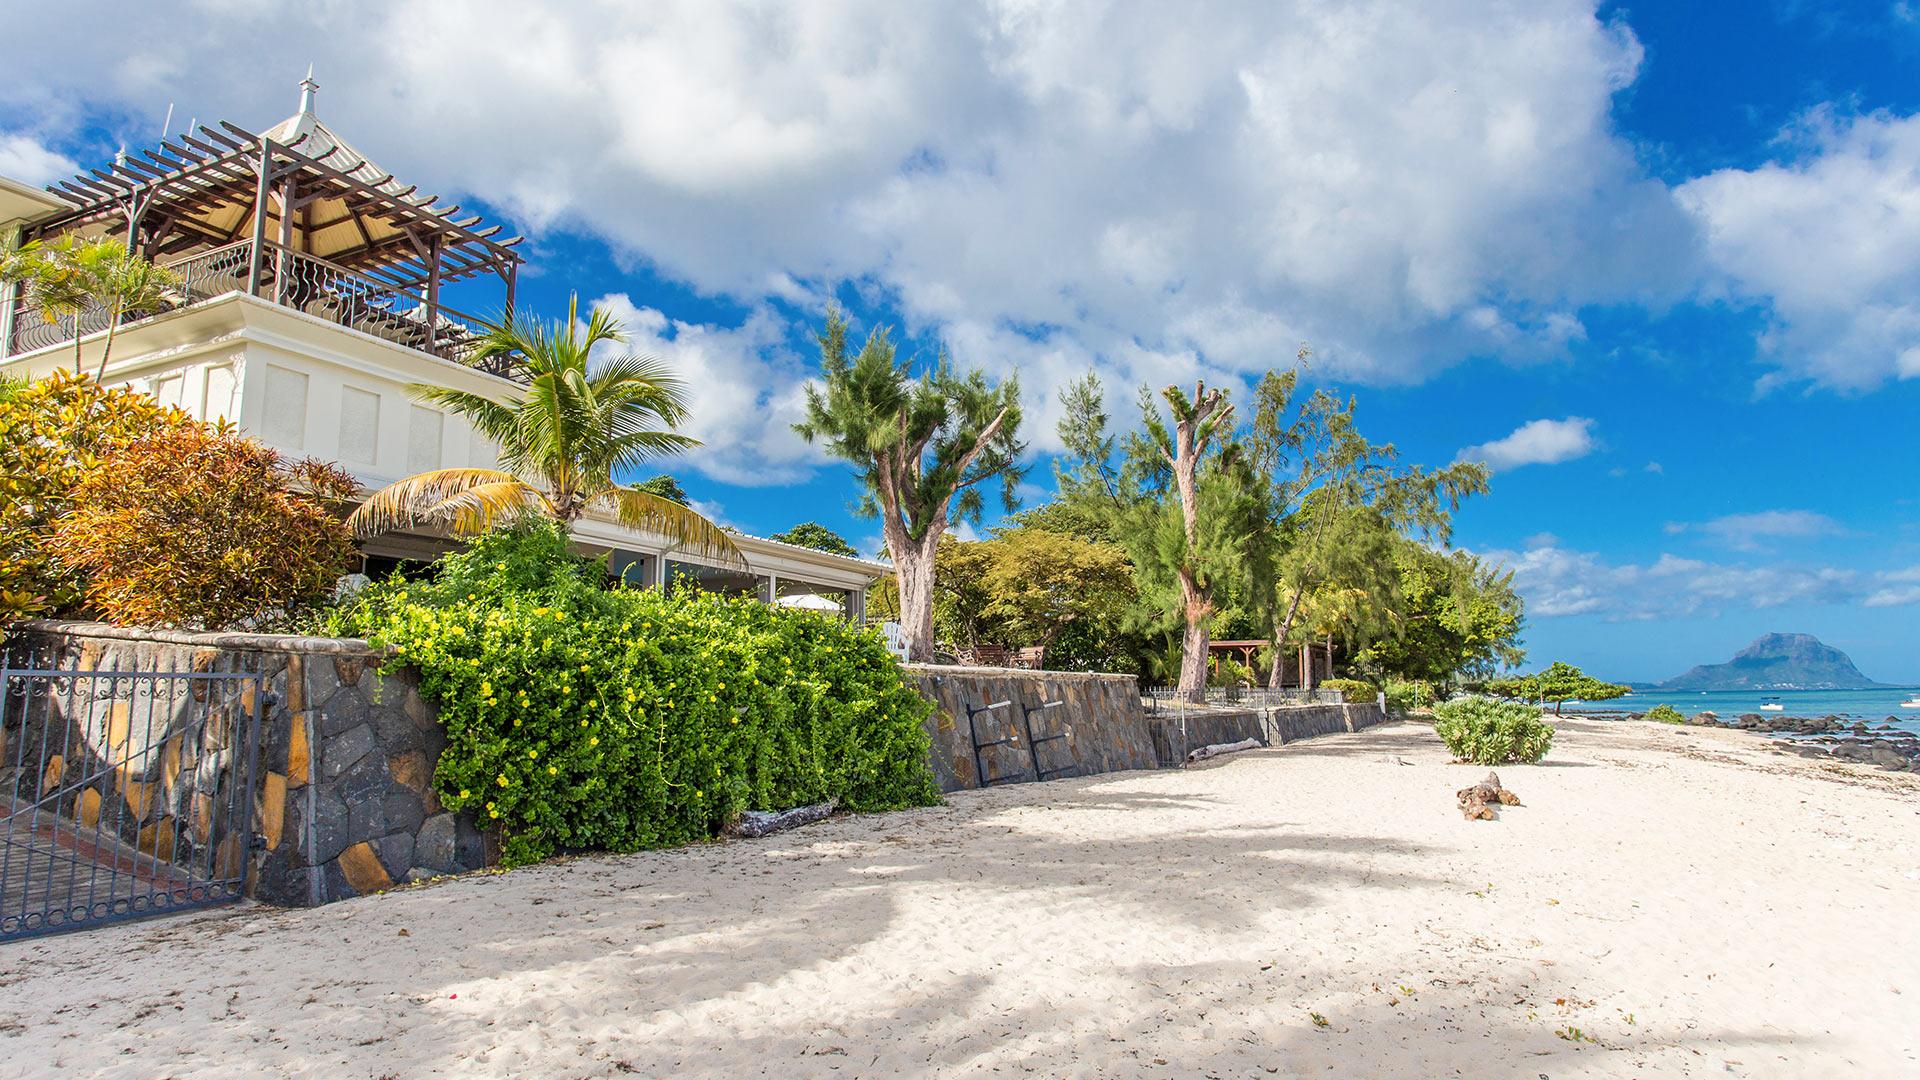 Villa Villa Turquoise, Rental in Mauritius West